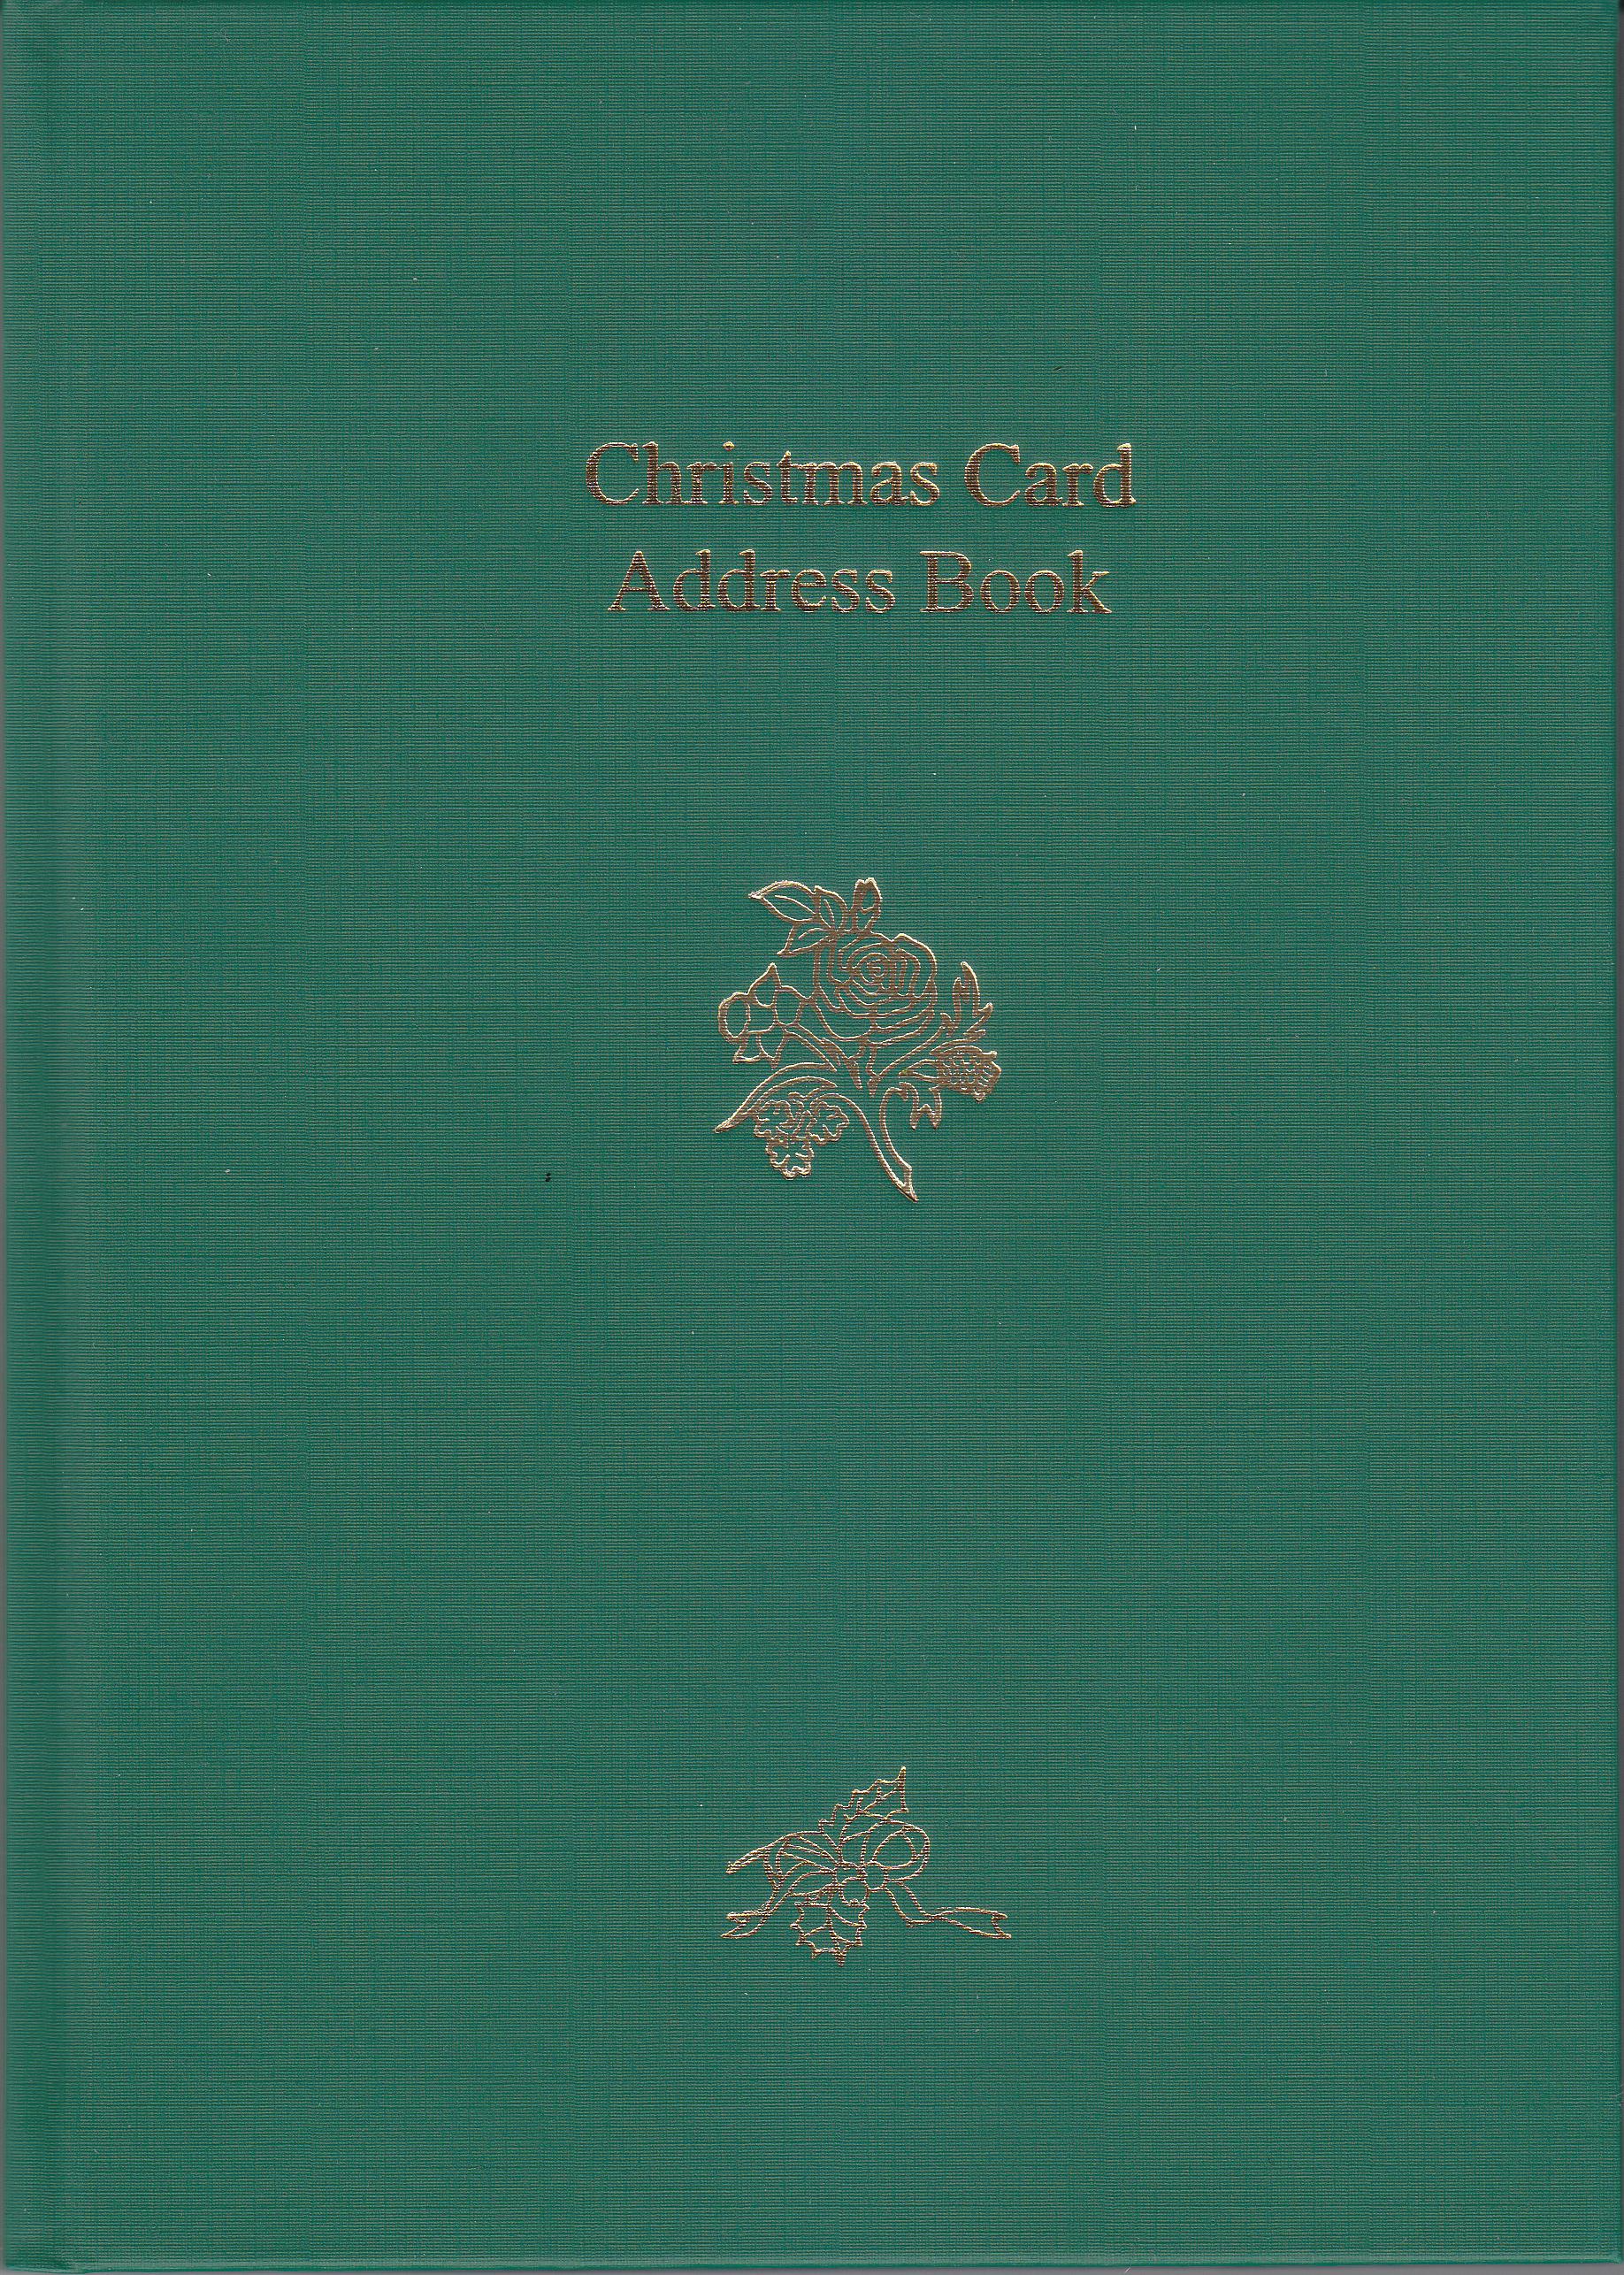 ADDRESS002-Xmas-Address-book-Greeen